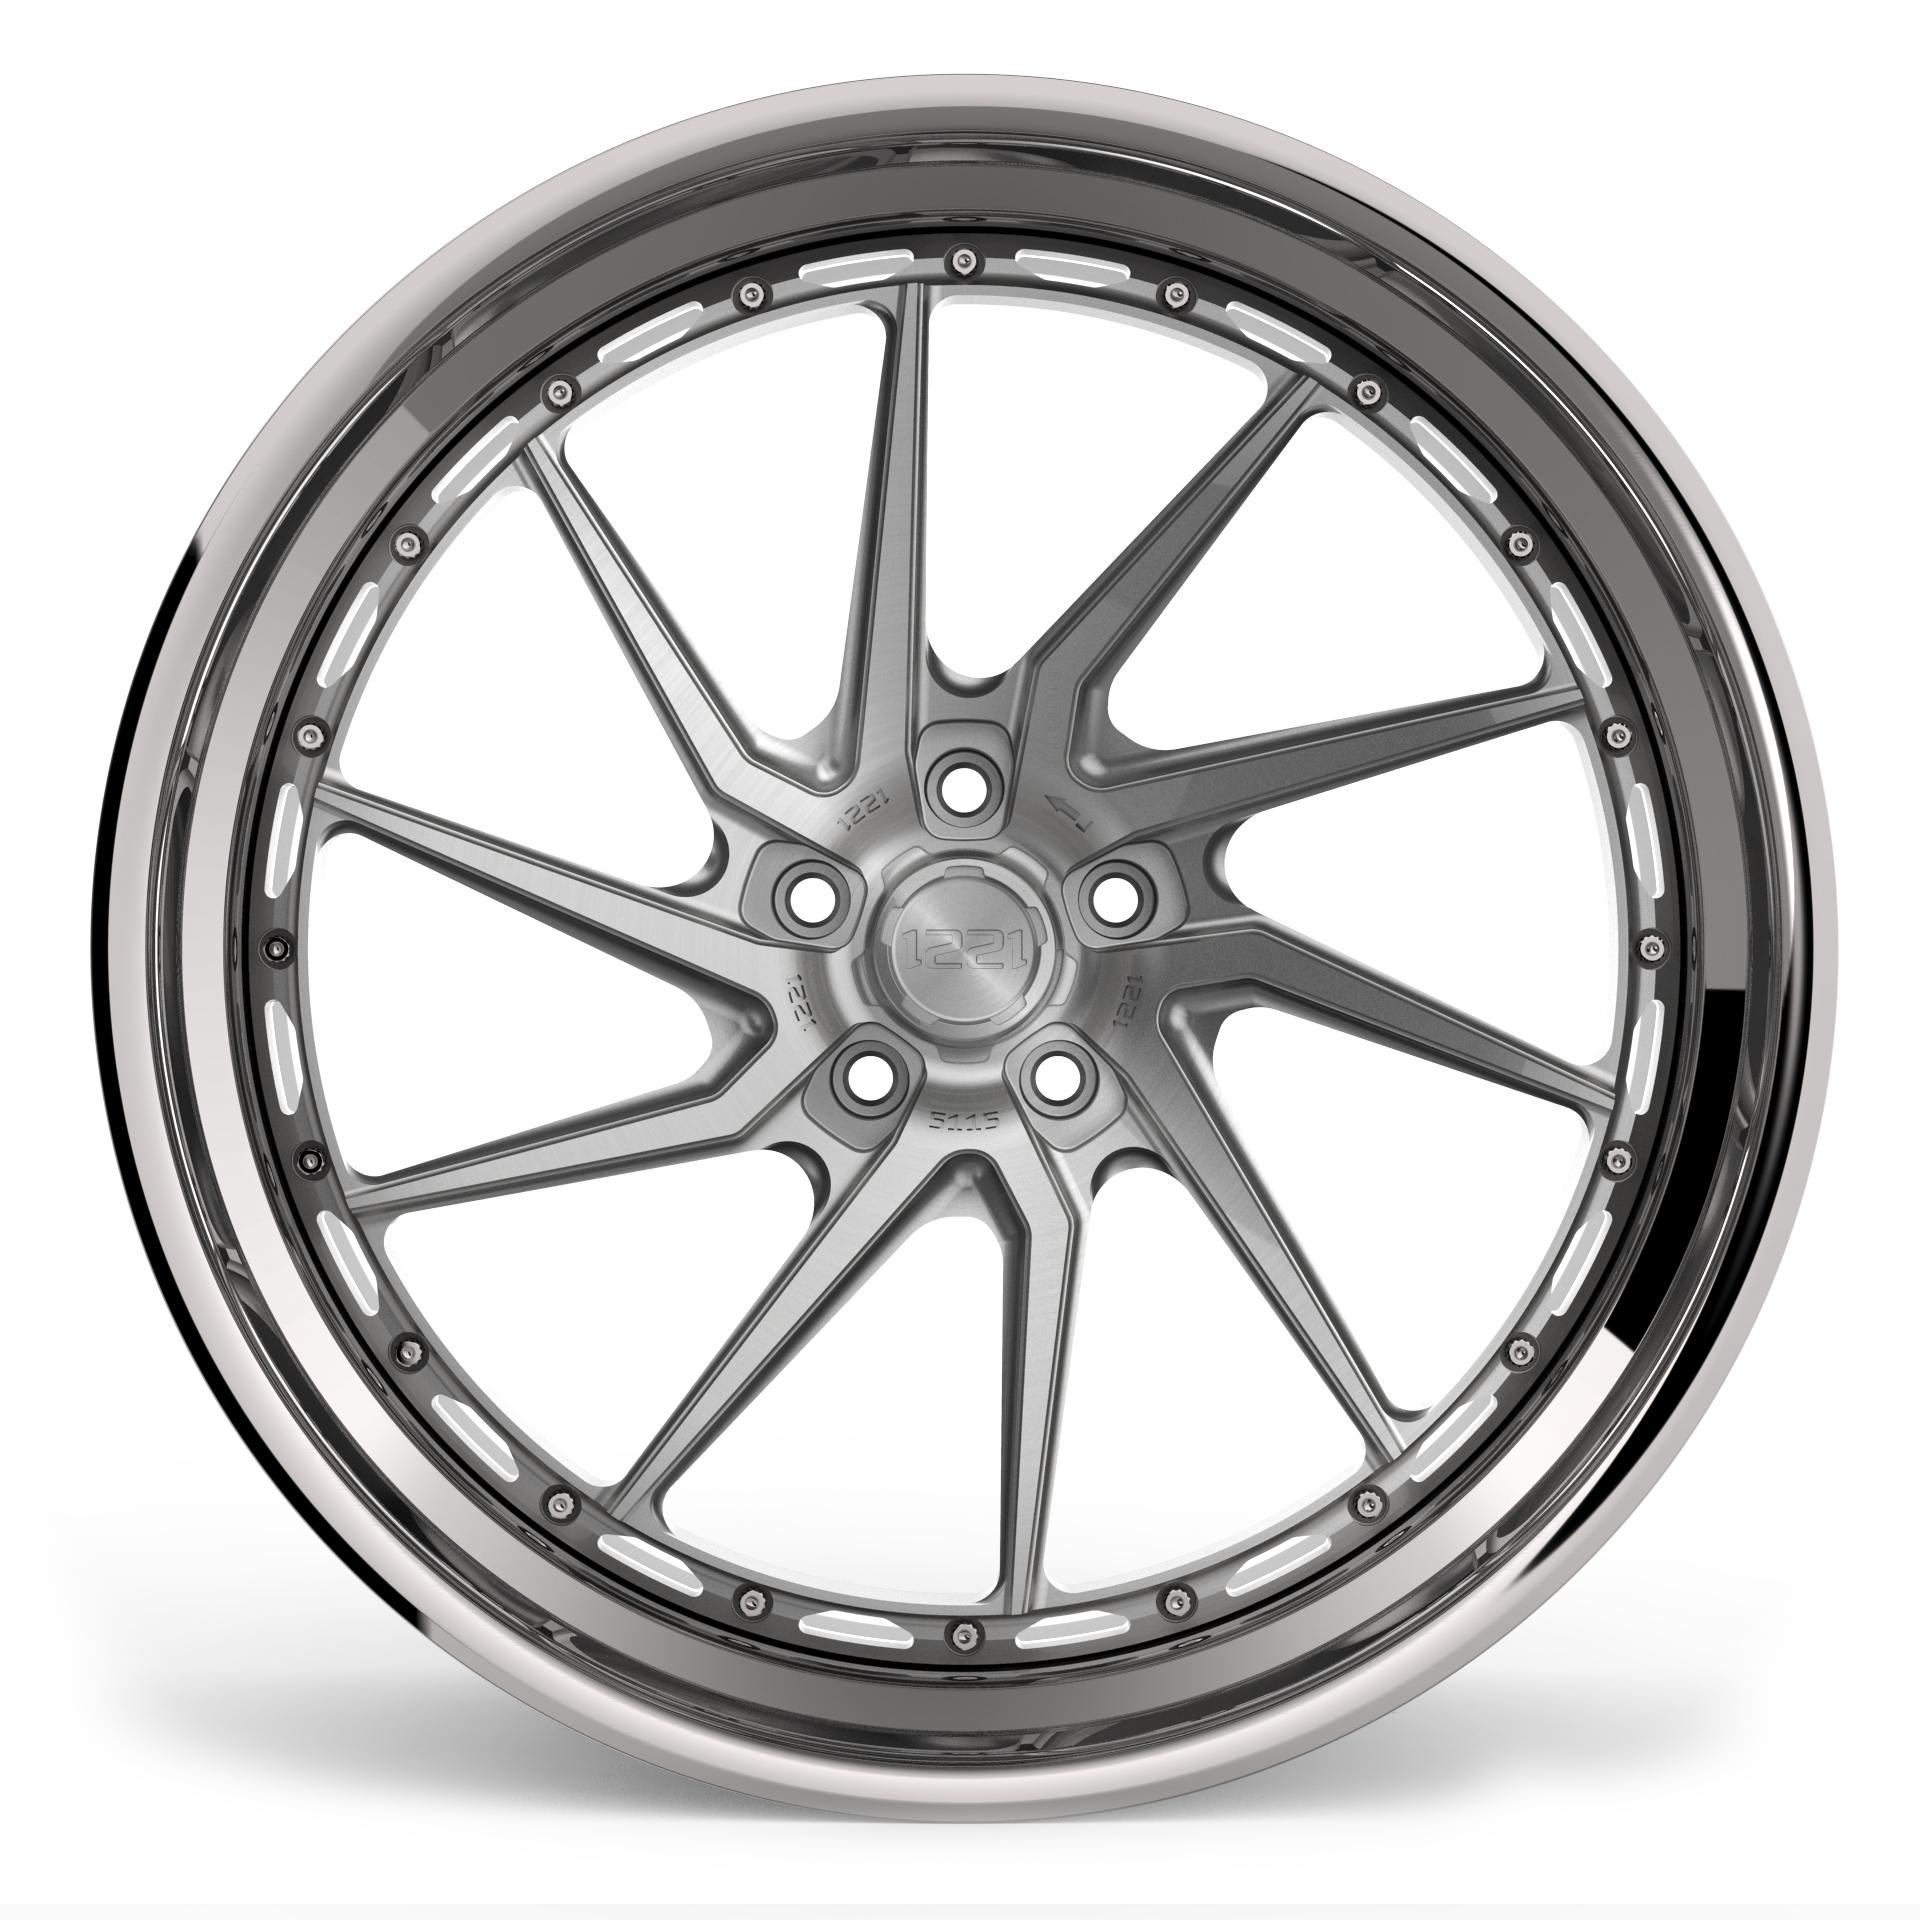 1221 Wheels R5115 AP3X APEX3.0 forged wheels